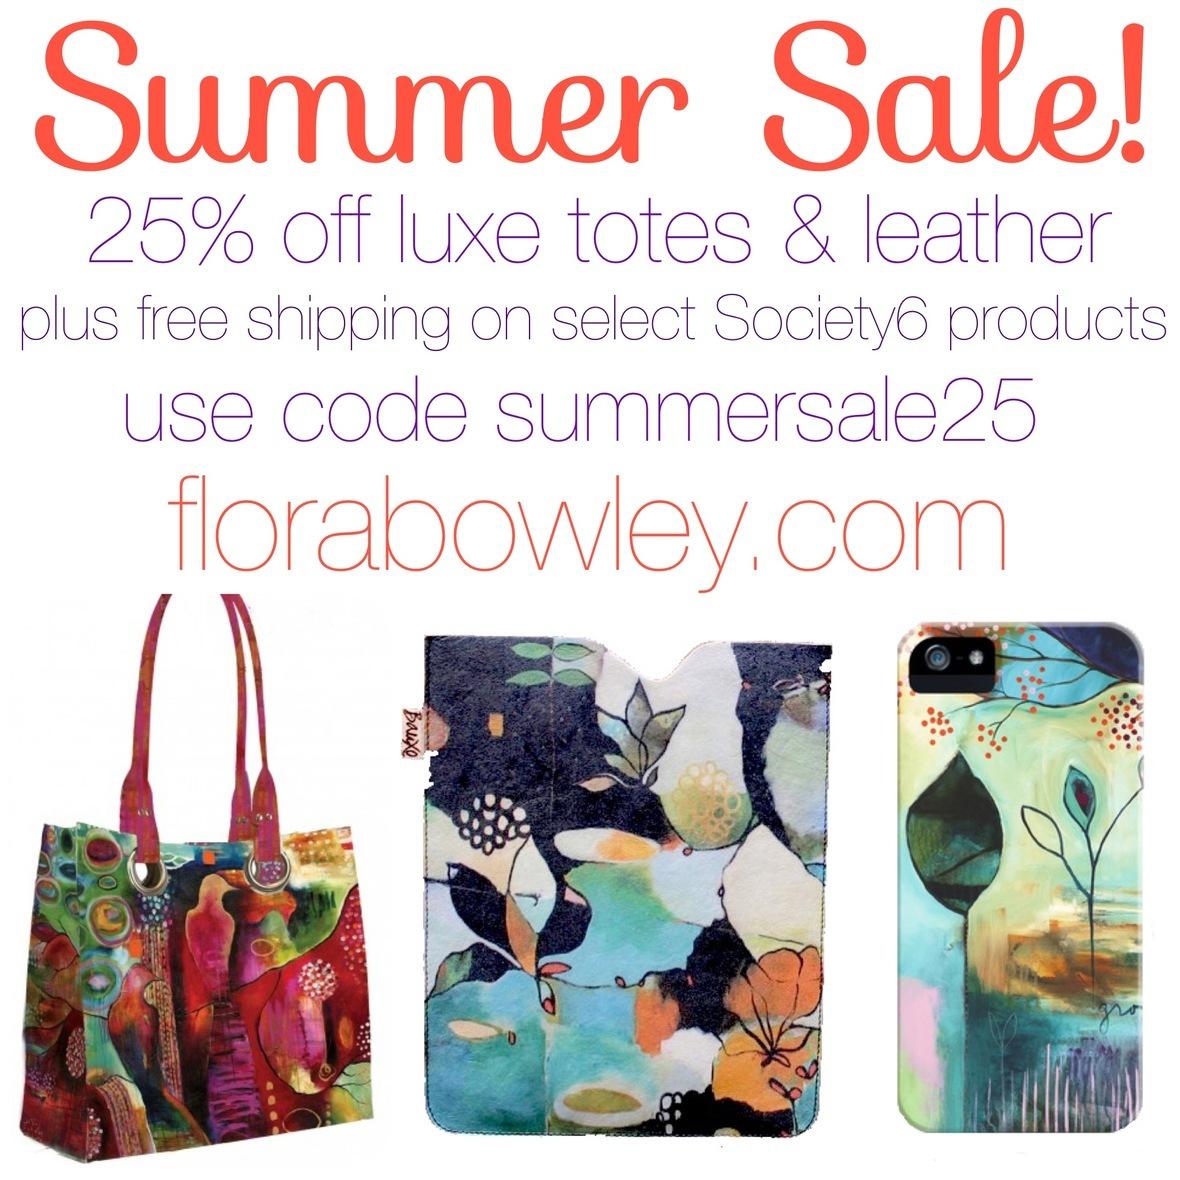 IG summersale 2014